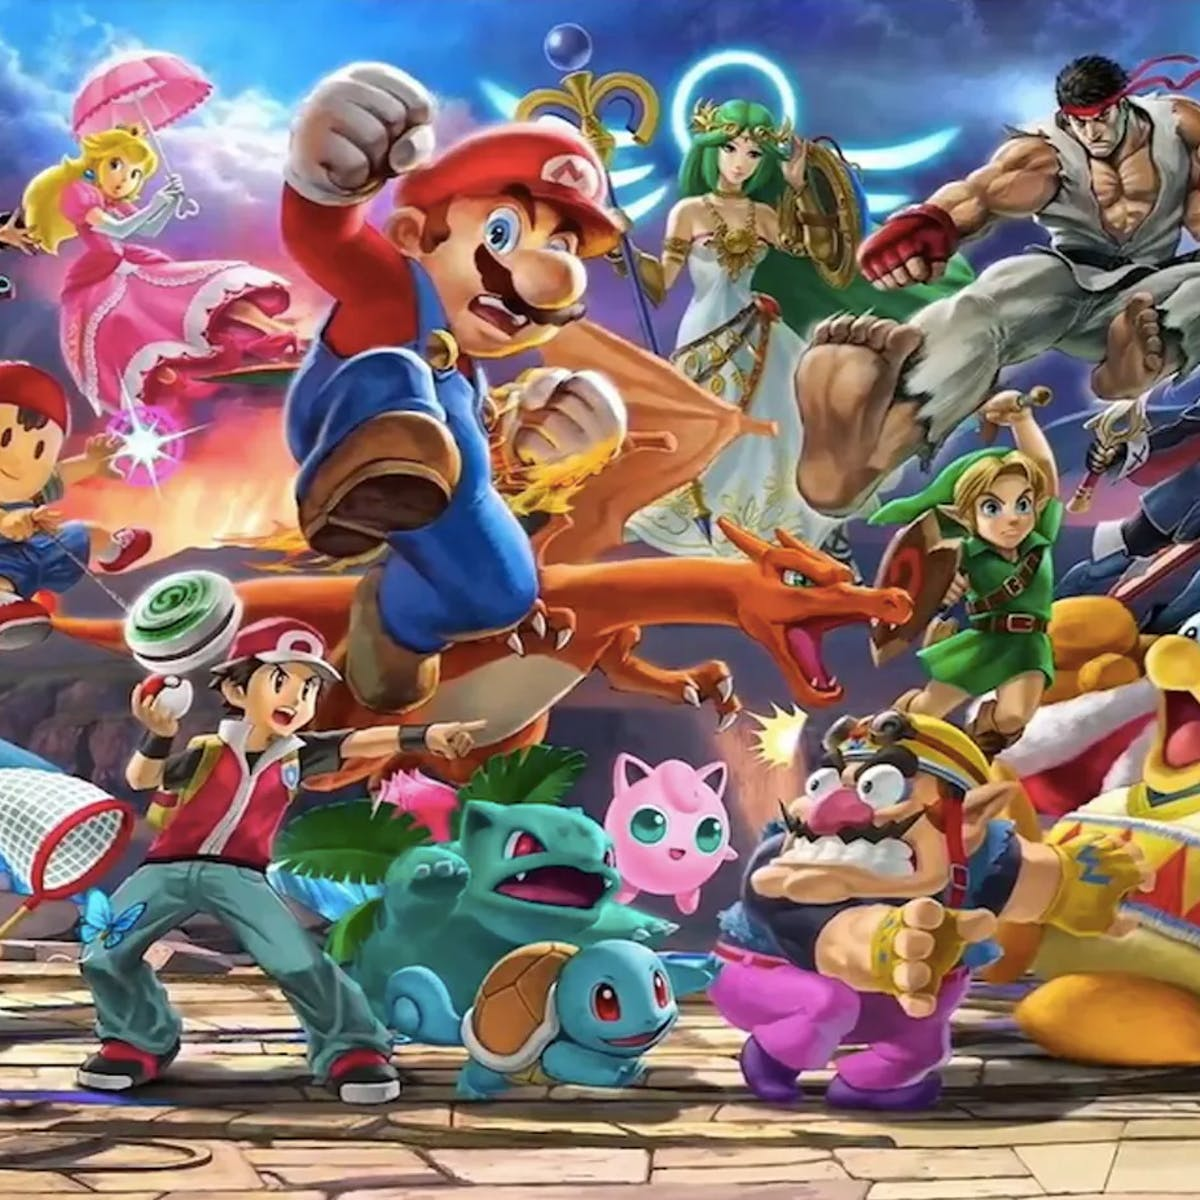 Smash Bros  Ultimate' Leaks, Release Date, DLC, Roster